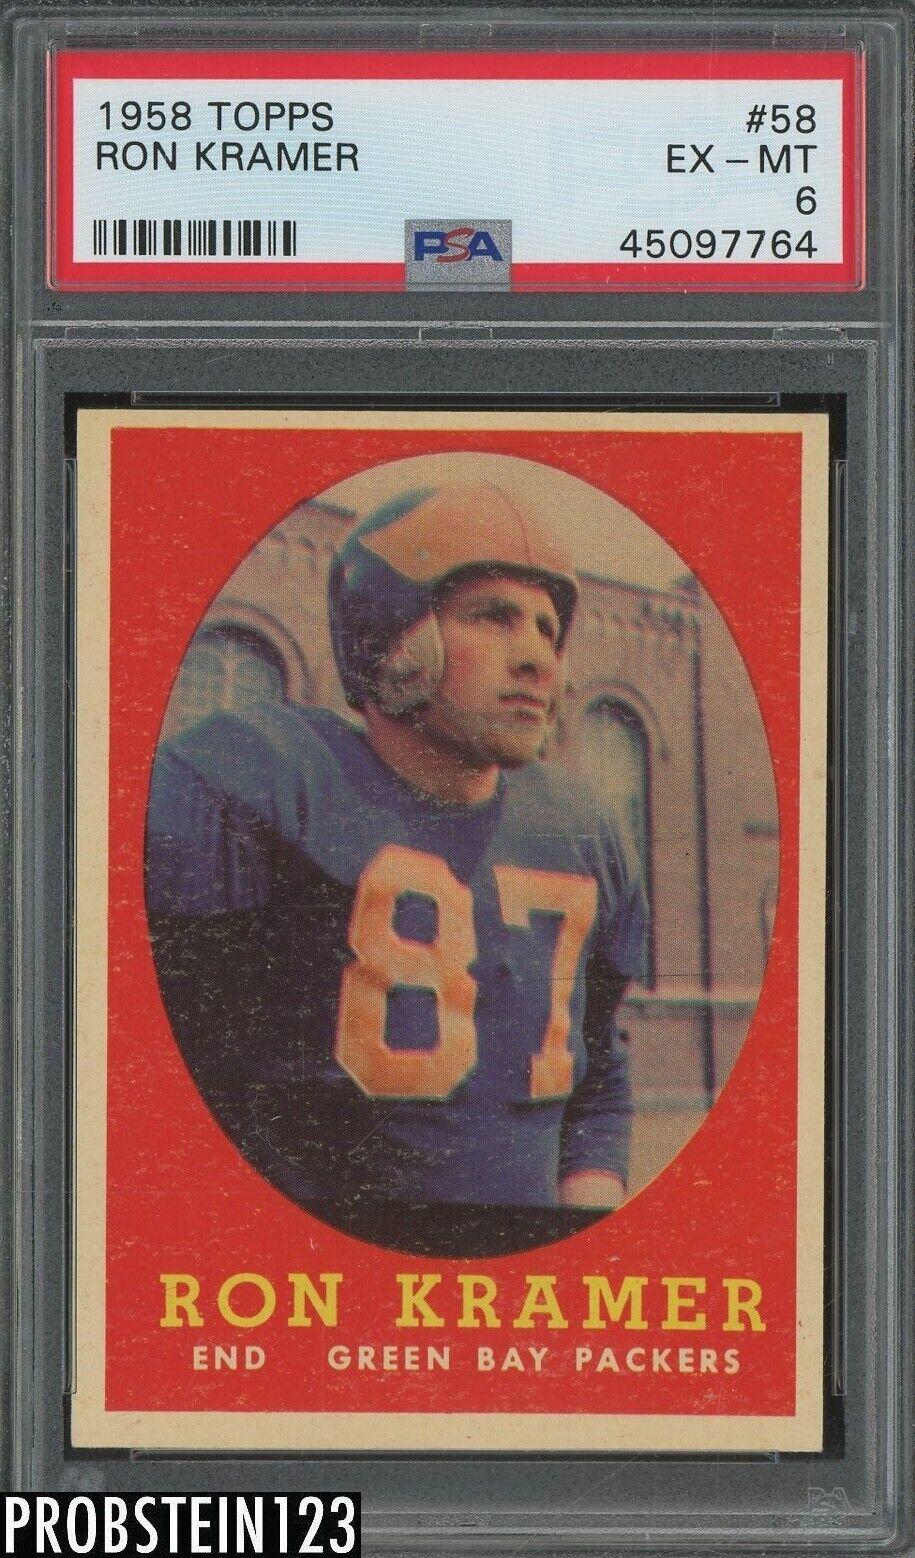 1958 Topps Football 58 Ron Kramer Green Bay Packers PSA 6 EX-MT - $77.88